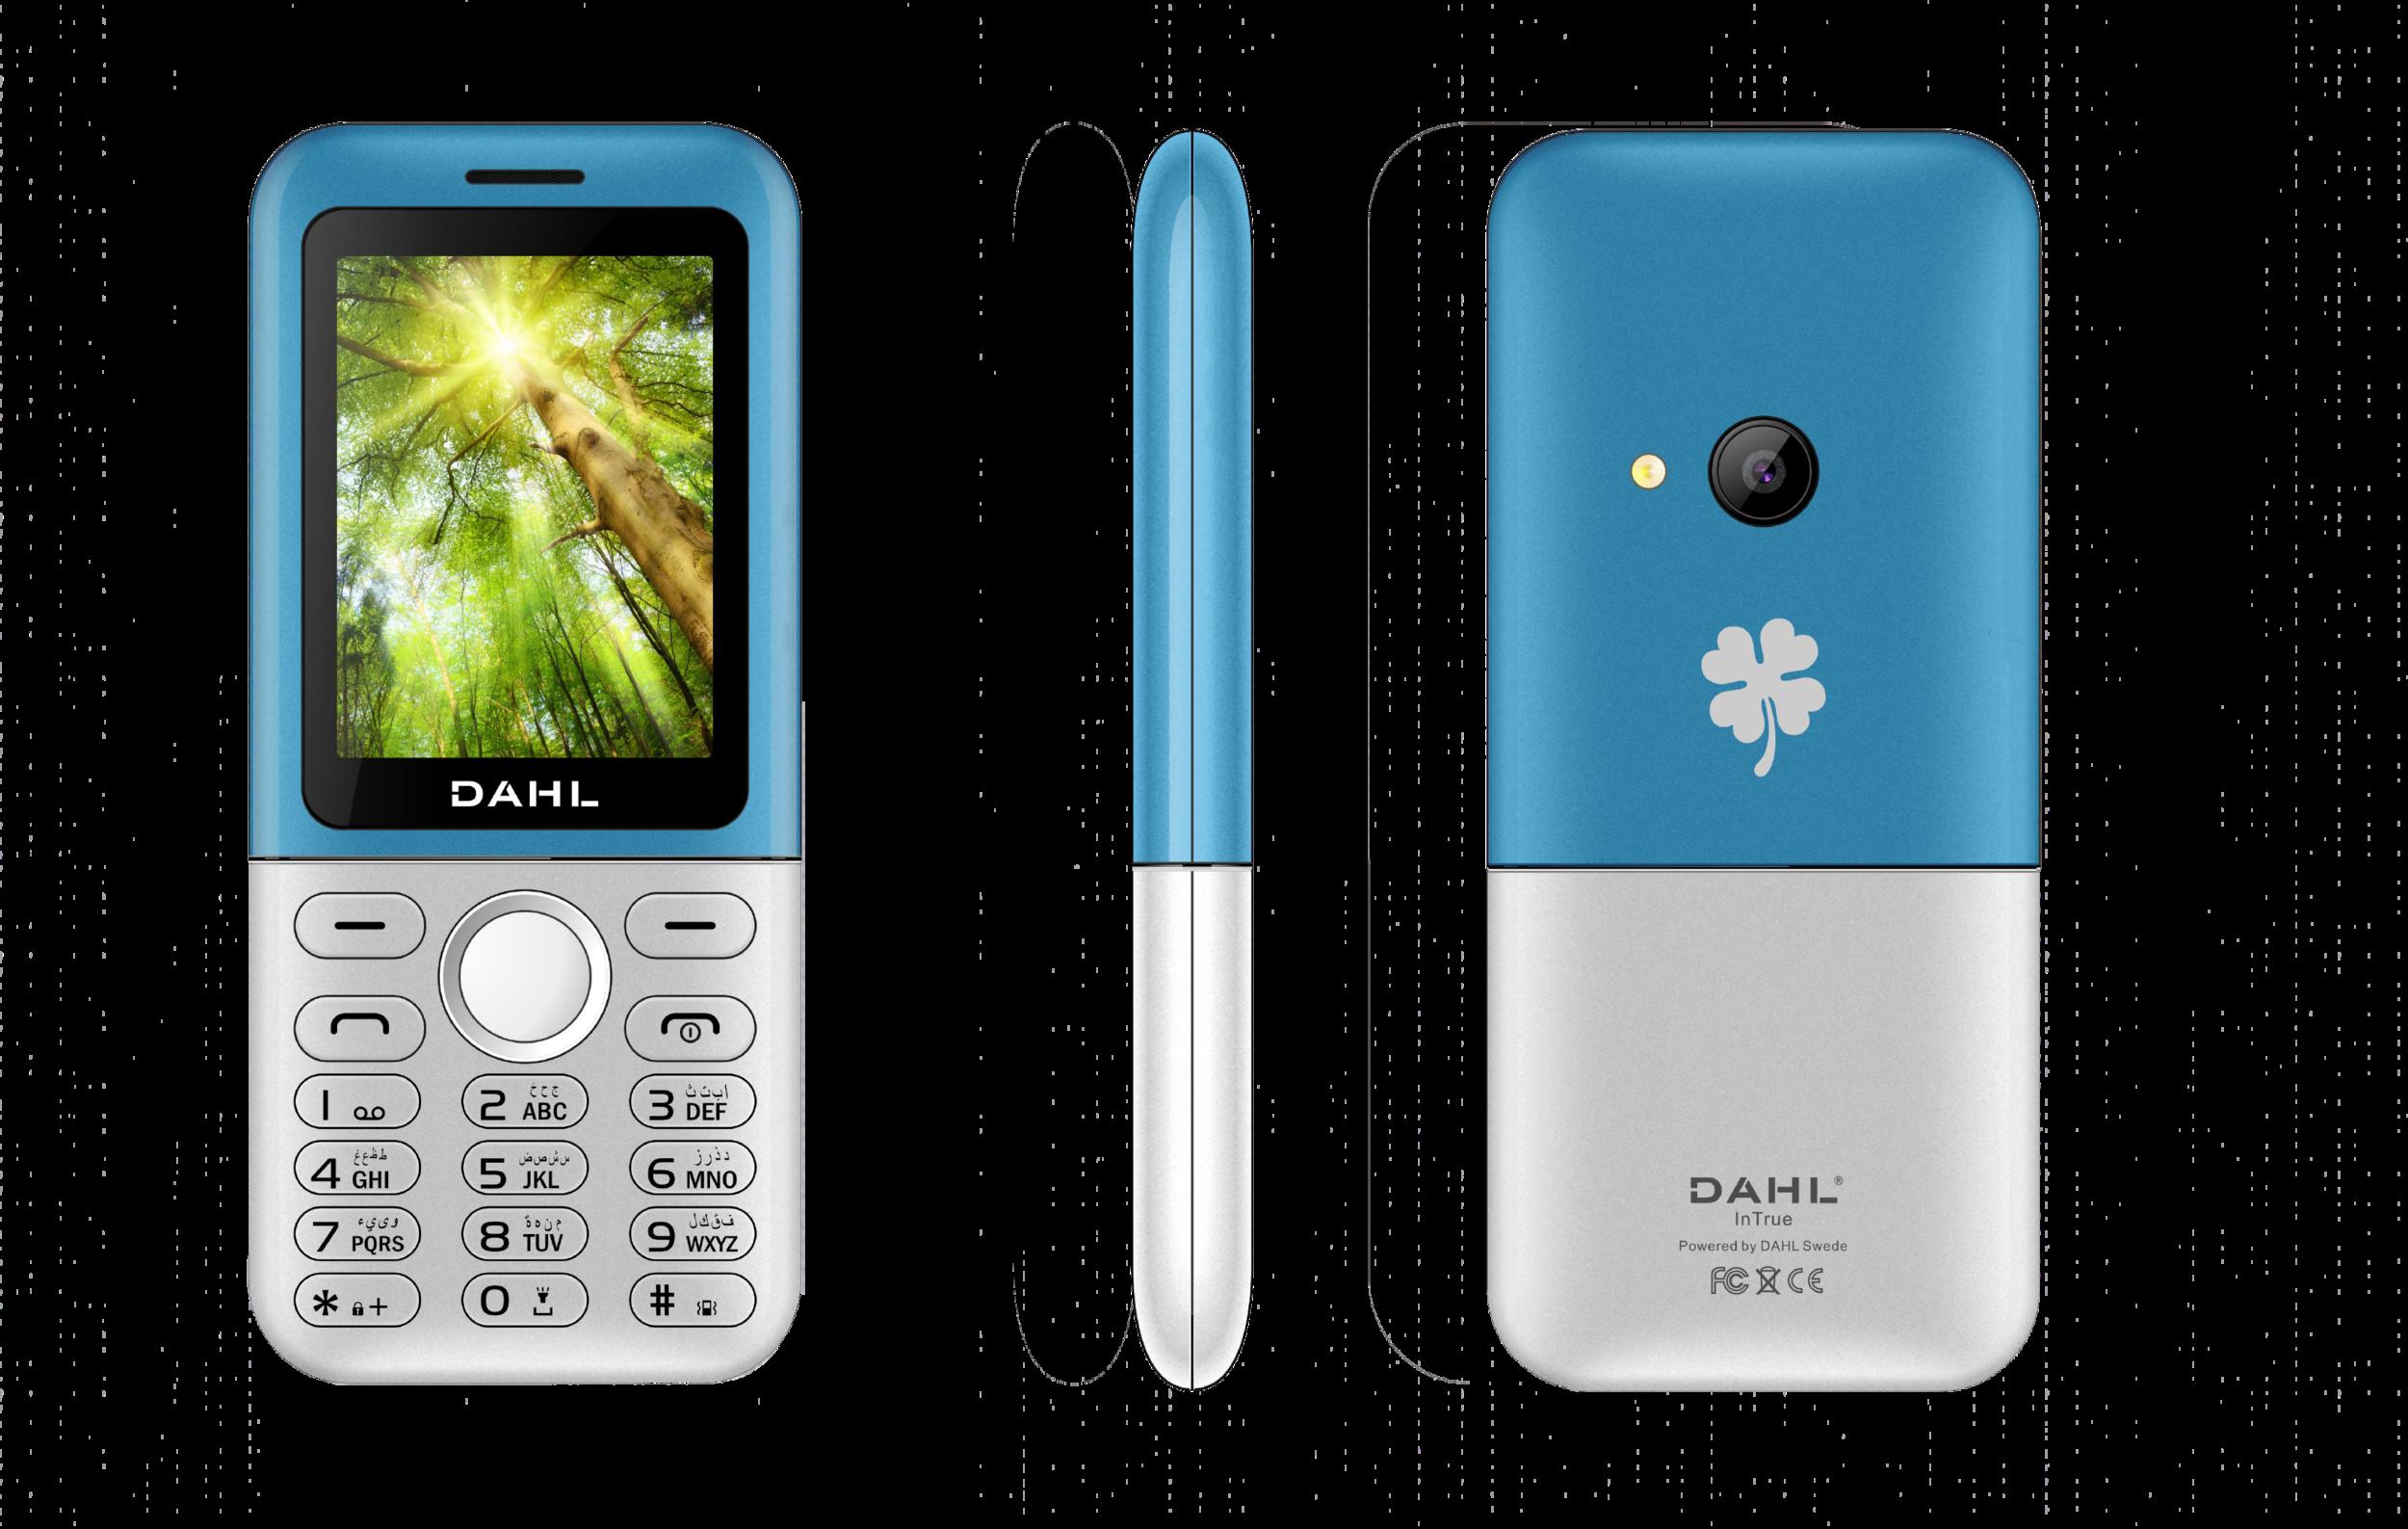 DAHL-InTro-7.1.png